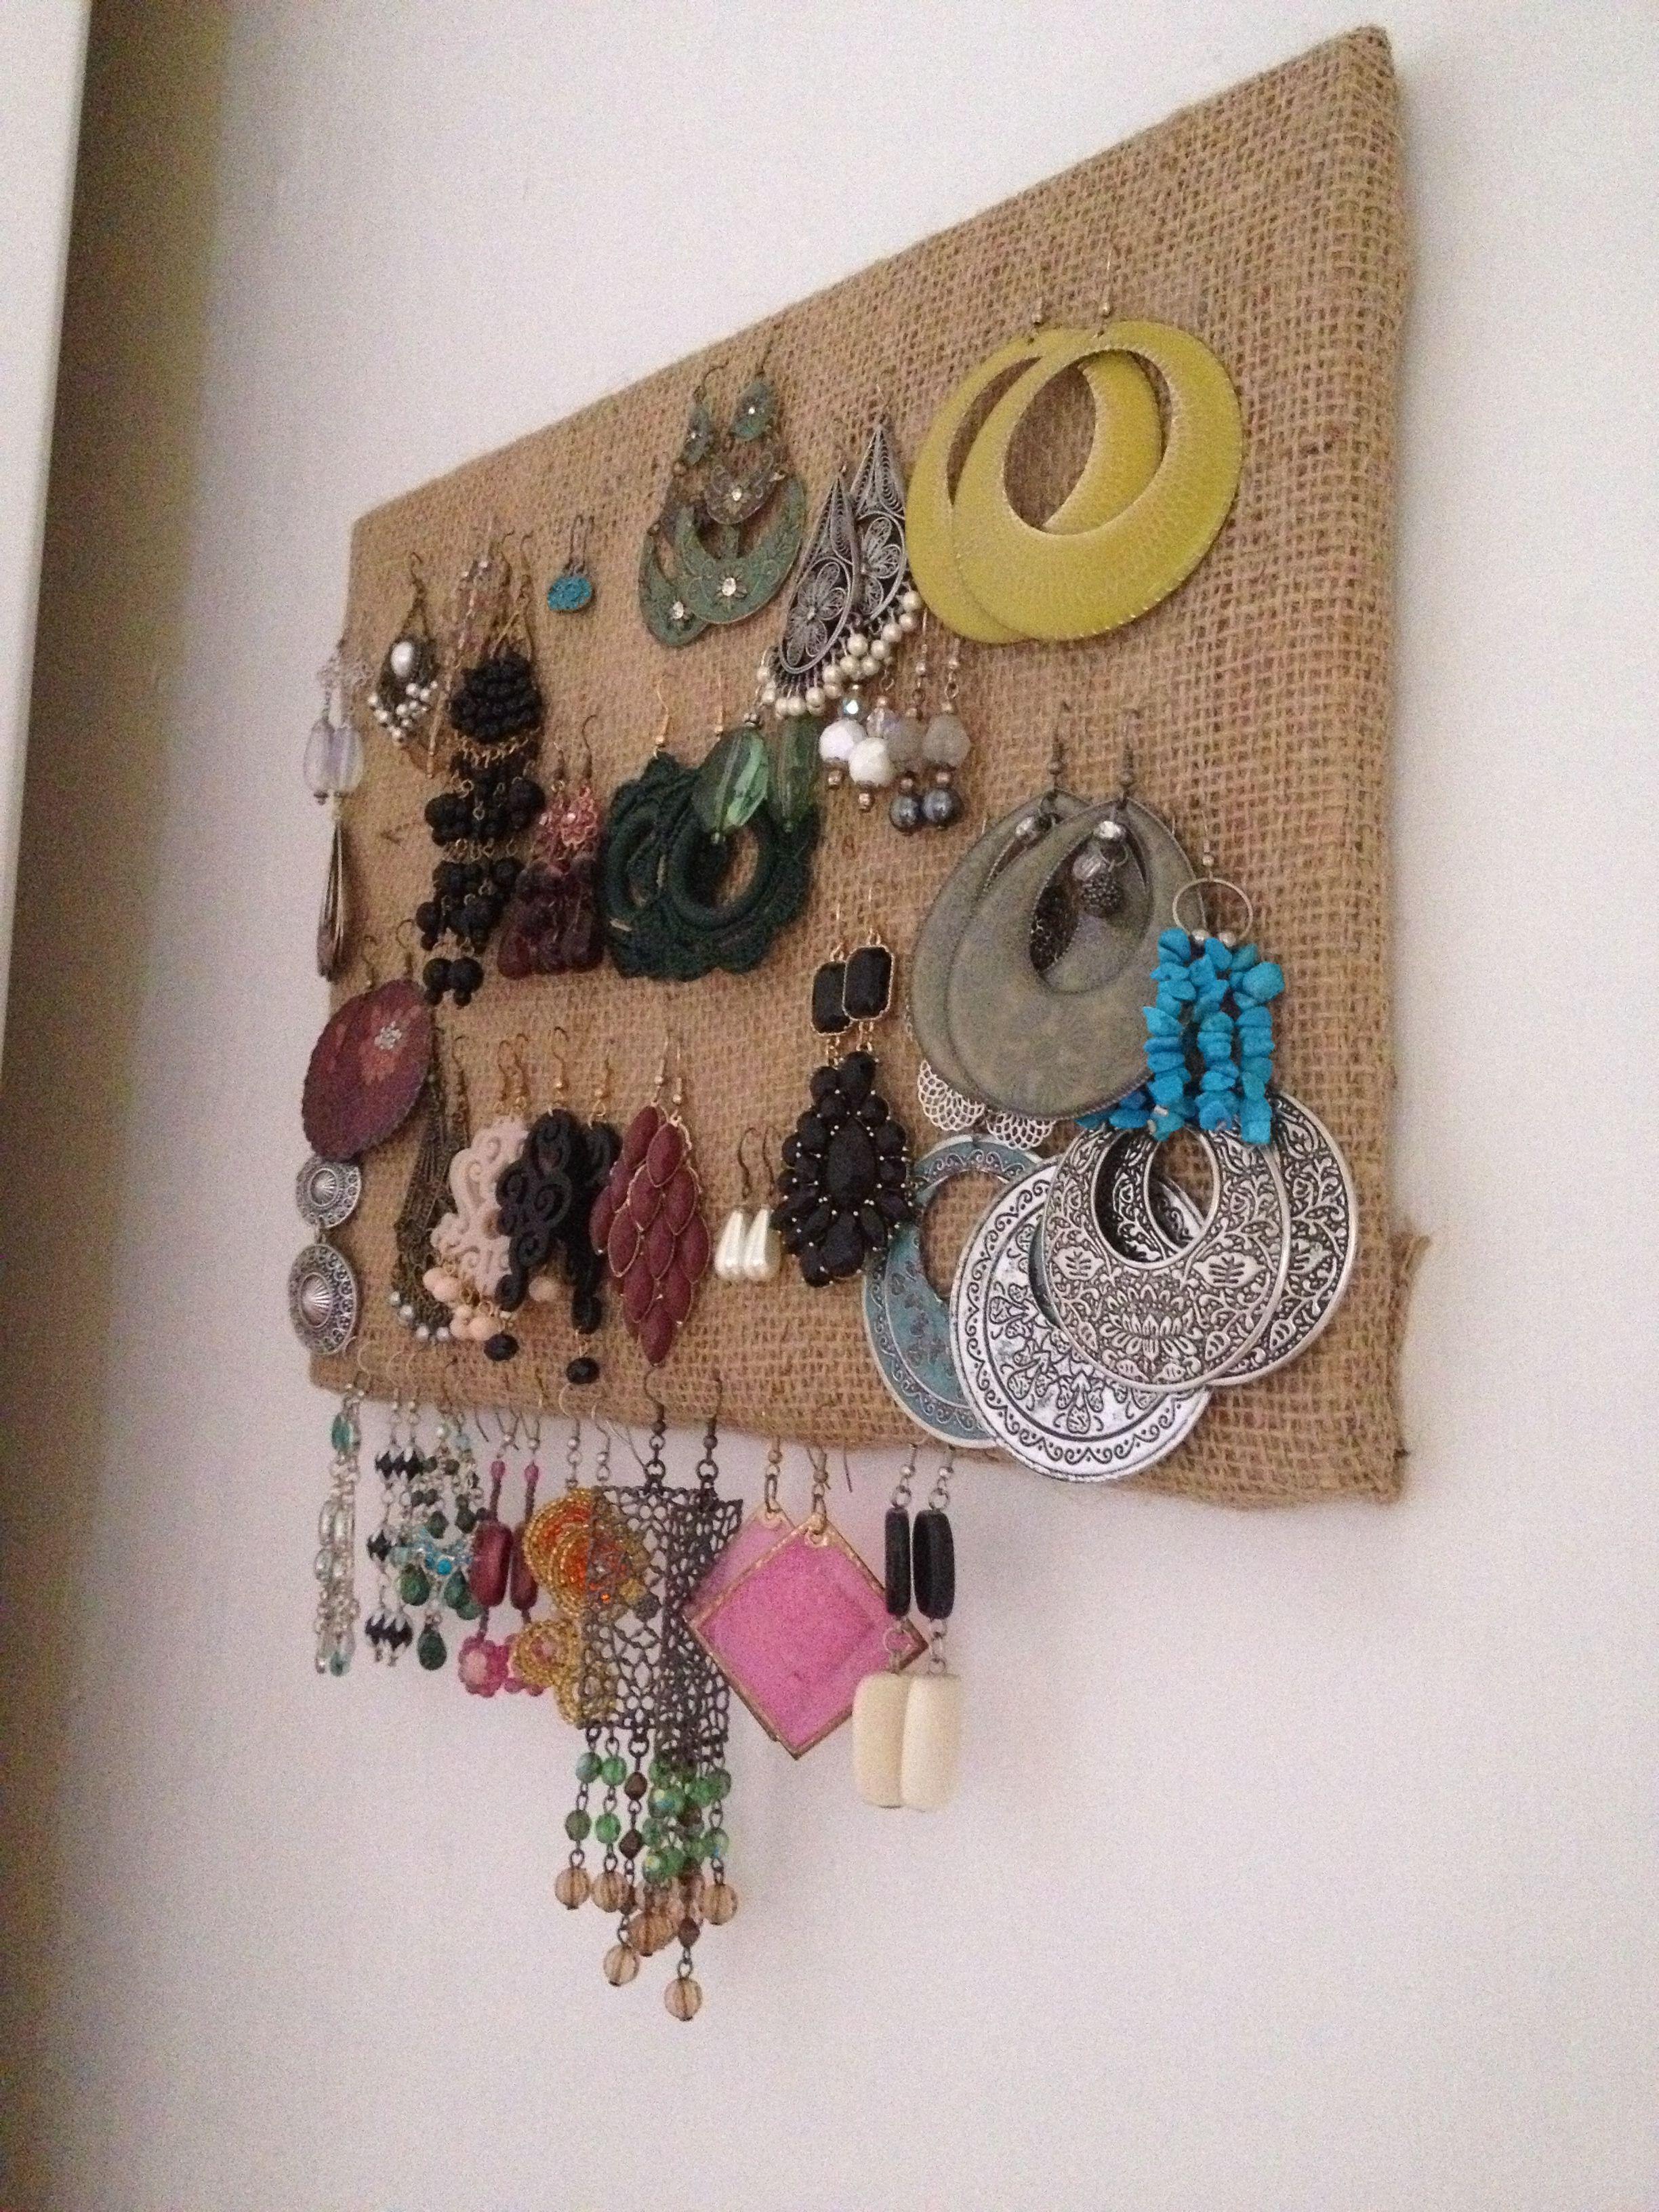 Porta orecchini fai da te idee originali pinterest tes and fai da te - Porta gioielli fai da te ...